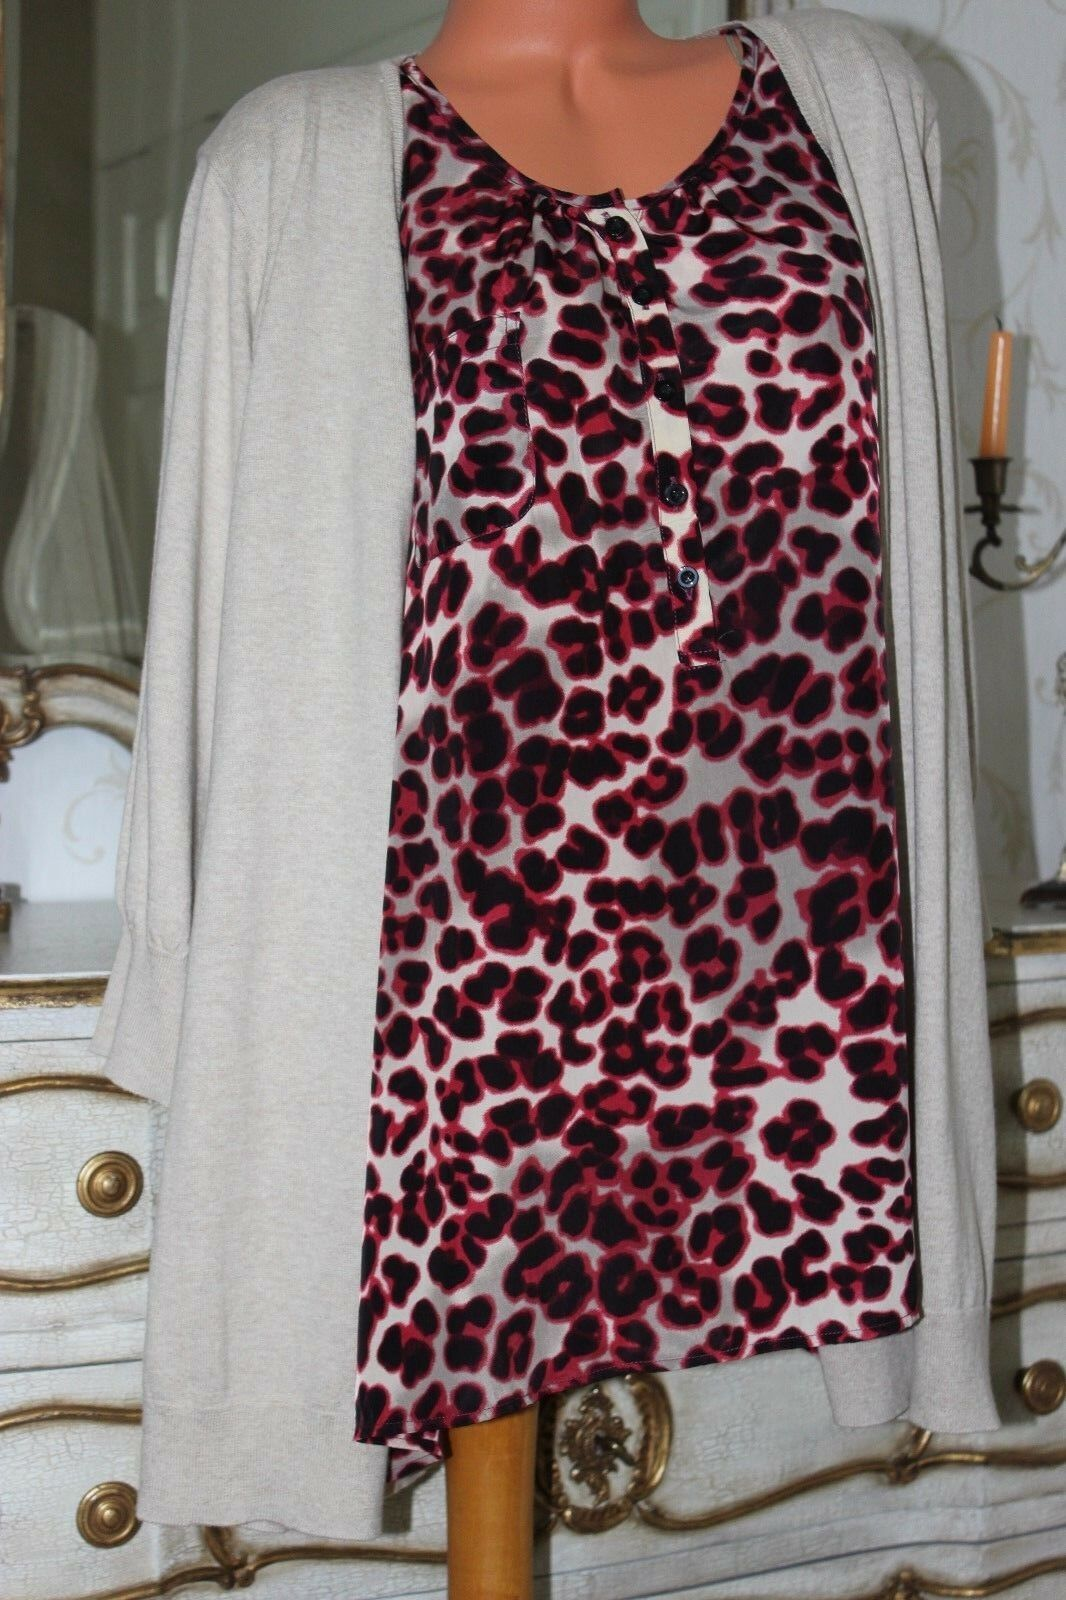 (Ref 27)  MARISOTA  Ladies 2 Piece Effect Blouse & Cardigan Size 32 34 UK NEW